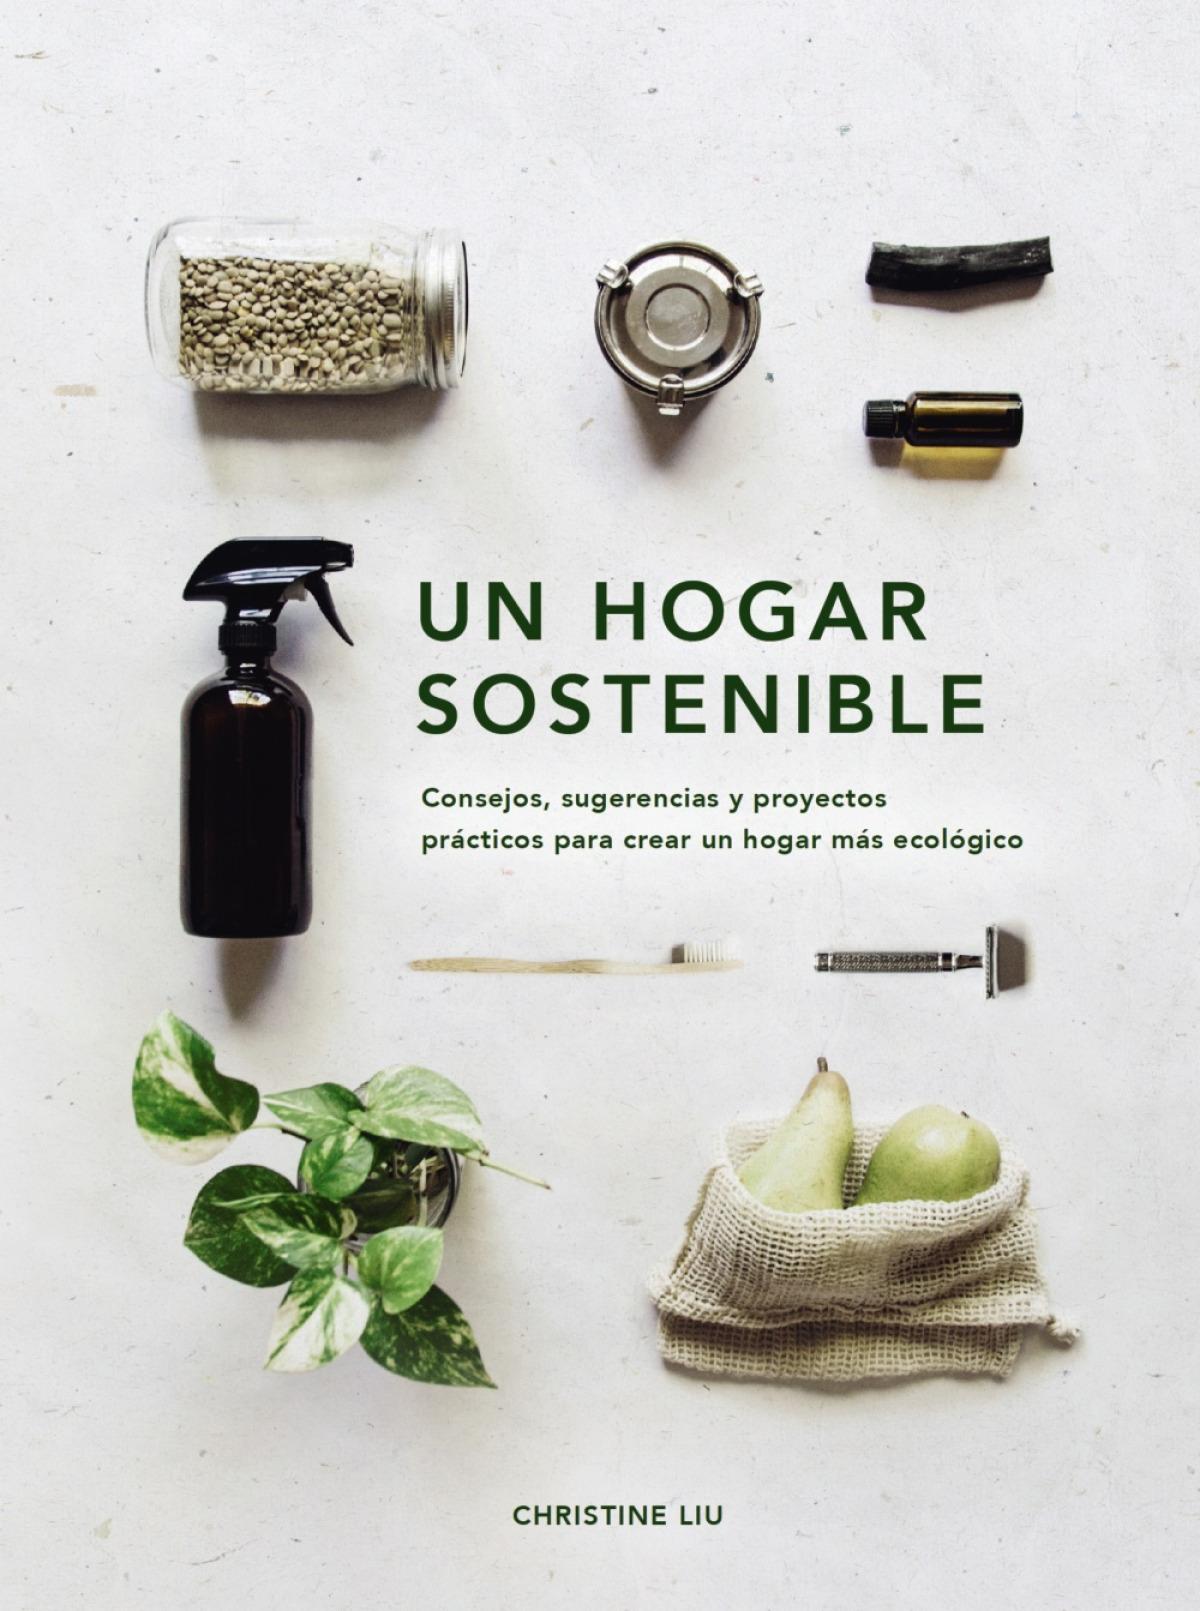 Un hogar sostenible 9788441543232